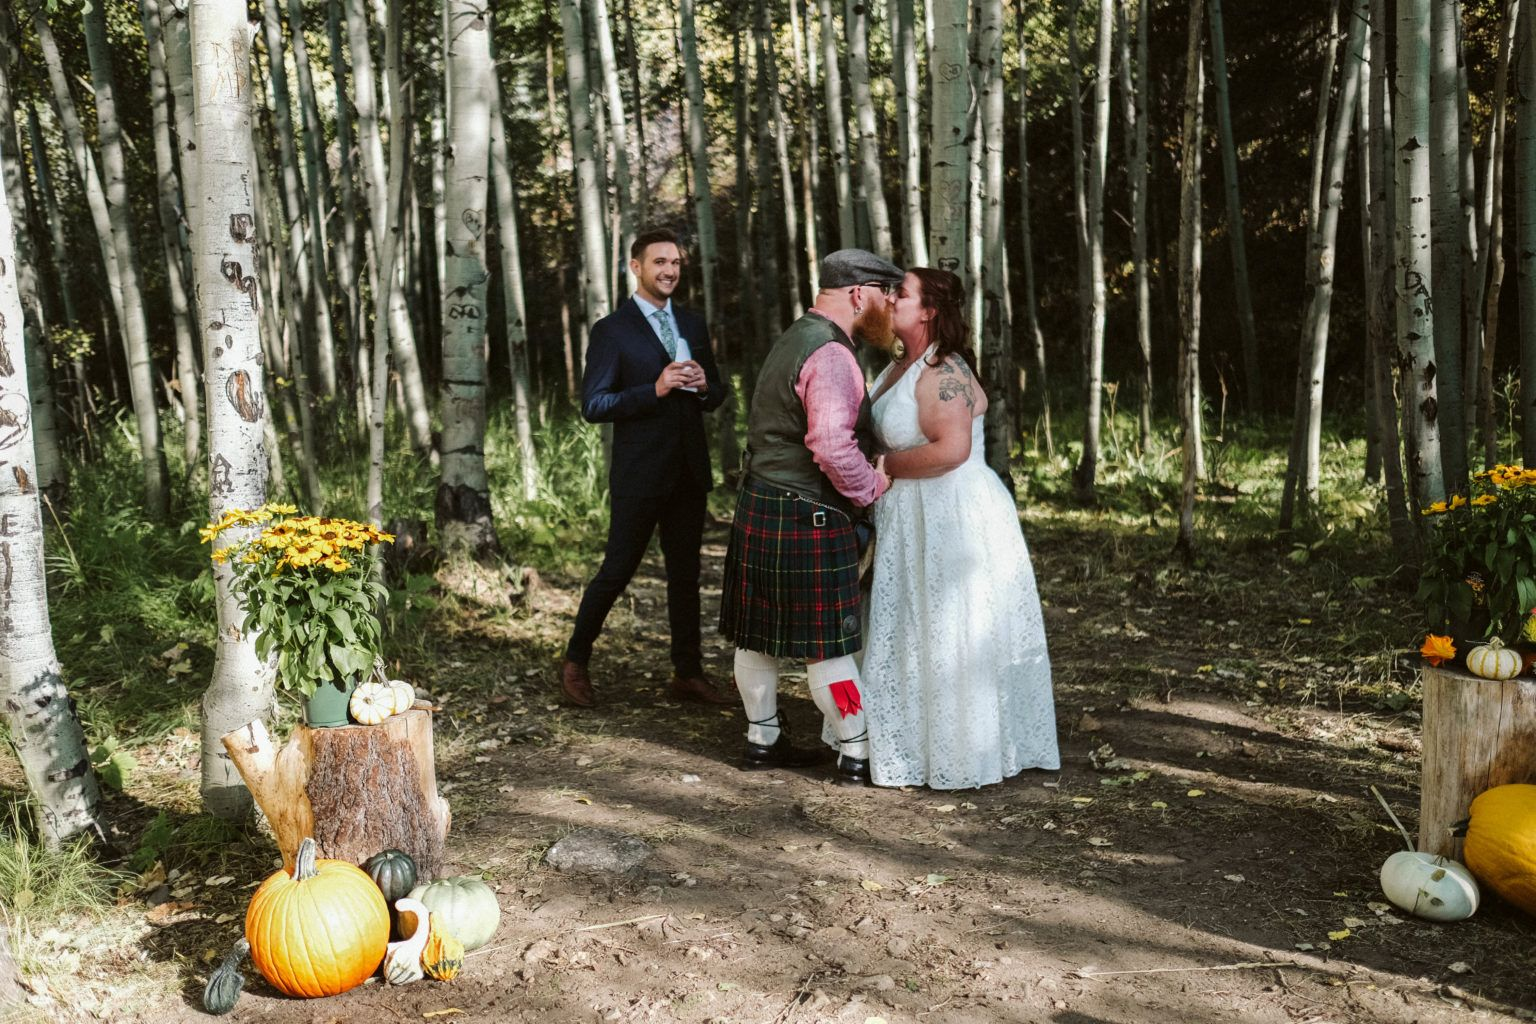 Golden Gate Canyon State Park Wedding in 2020 | Colorado ...